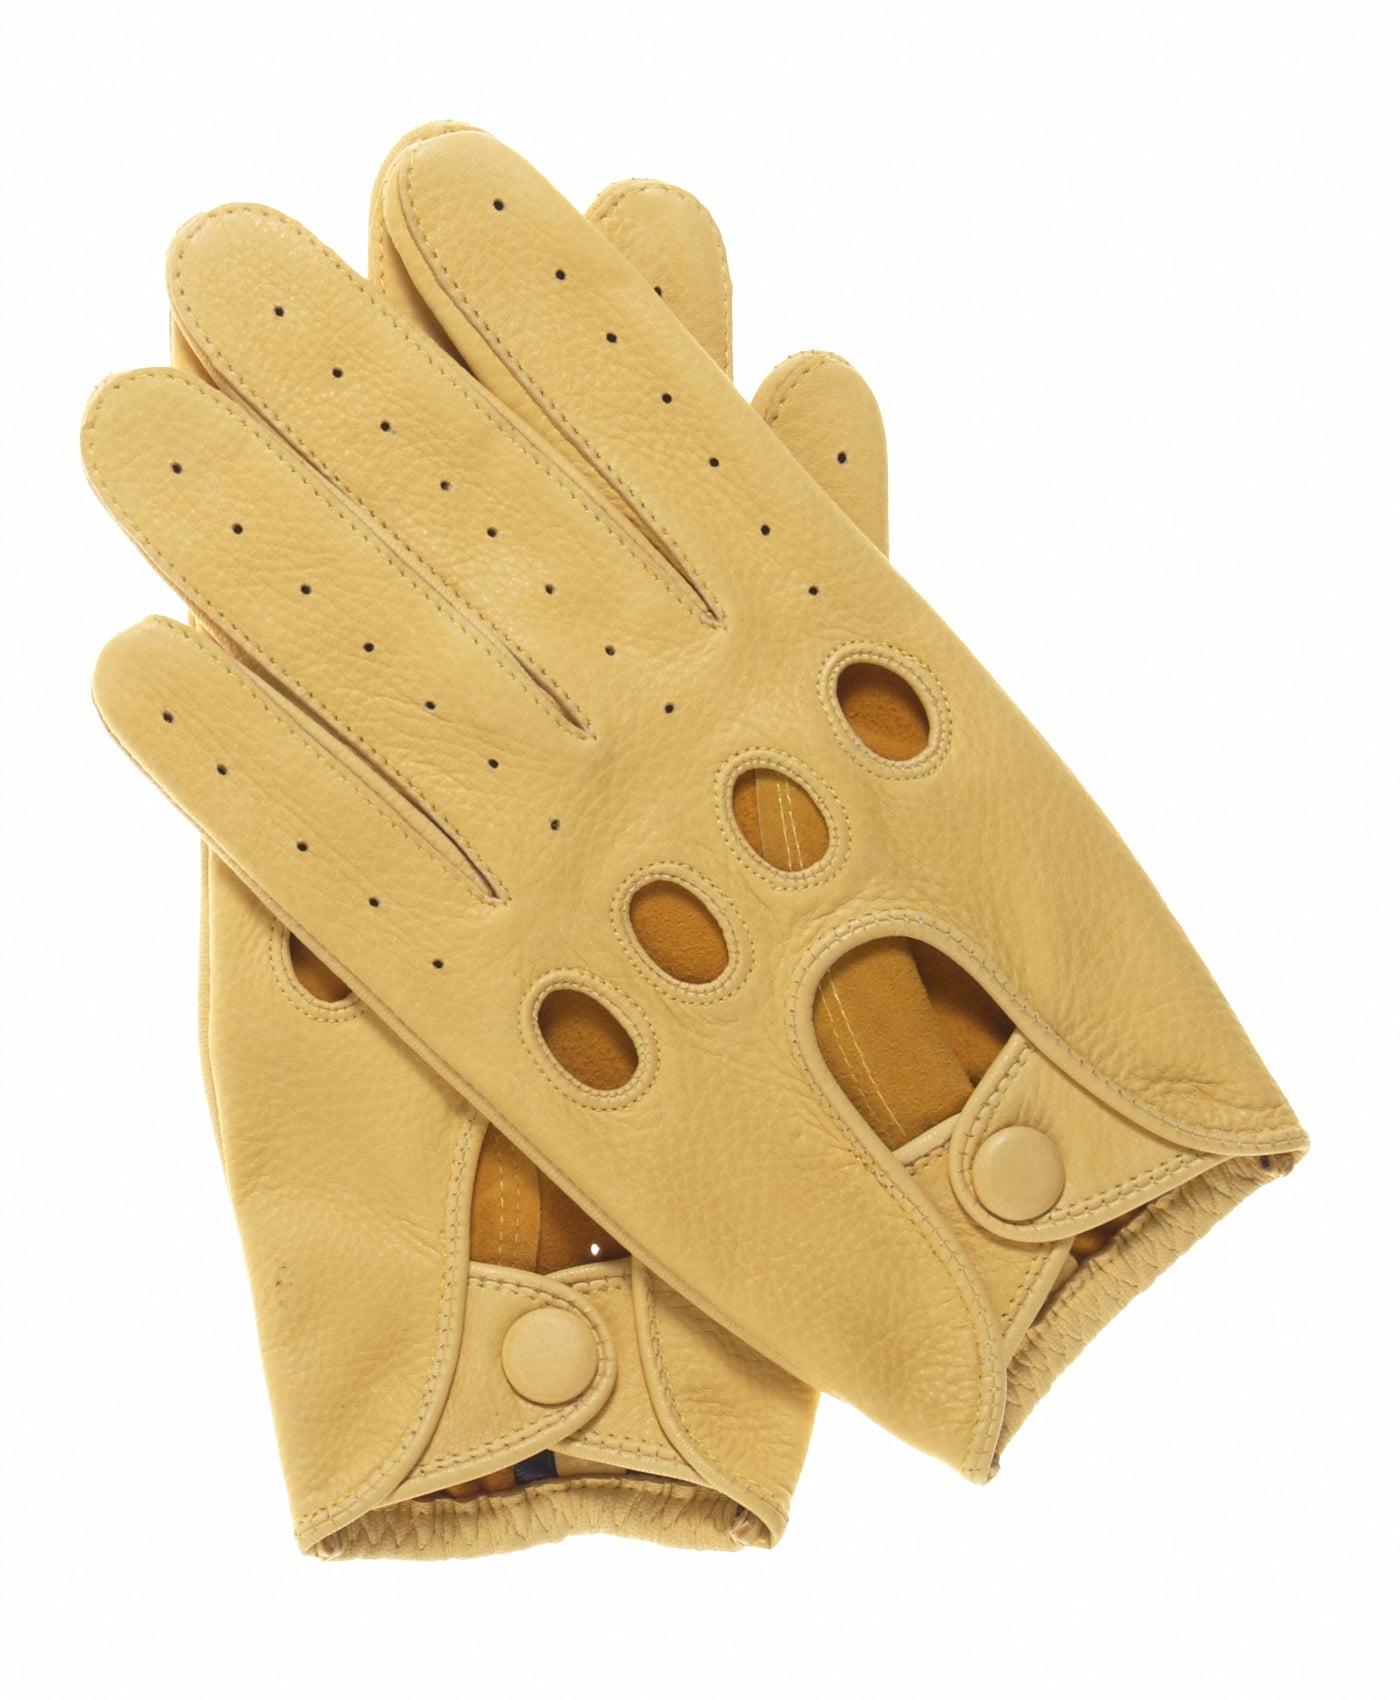 Driving gloves at walmart - American Classics Men S Deerskin Driving Gloves